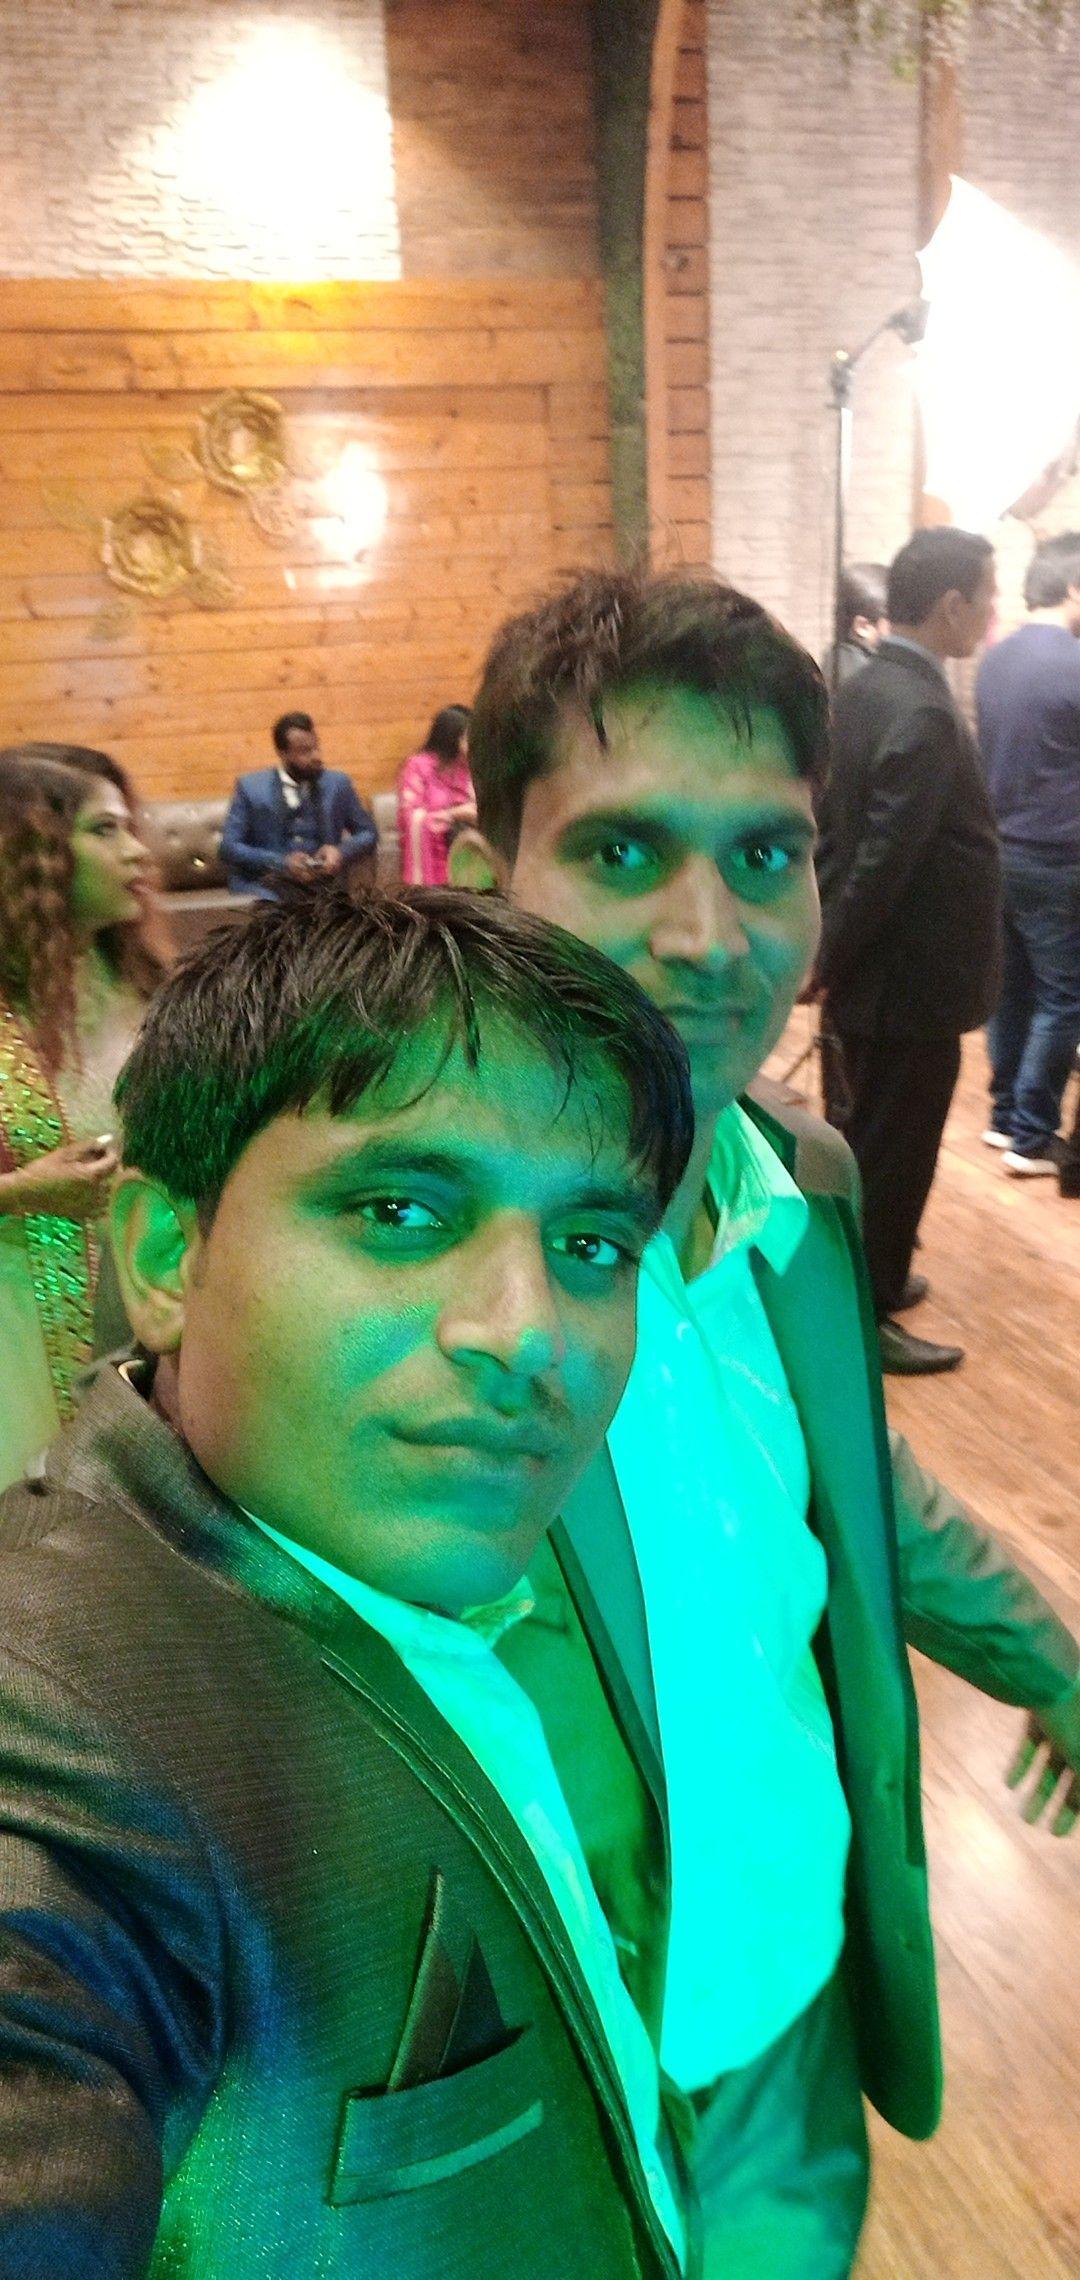 Pin by Mahesh Kumar on Free mp3 music download Free mp3